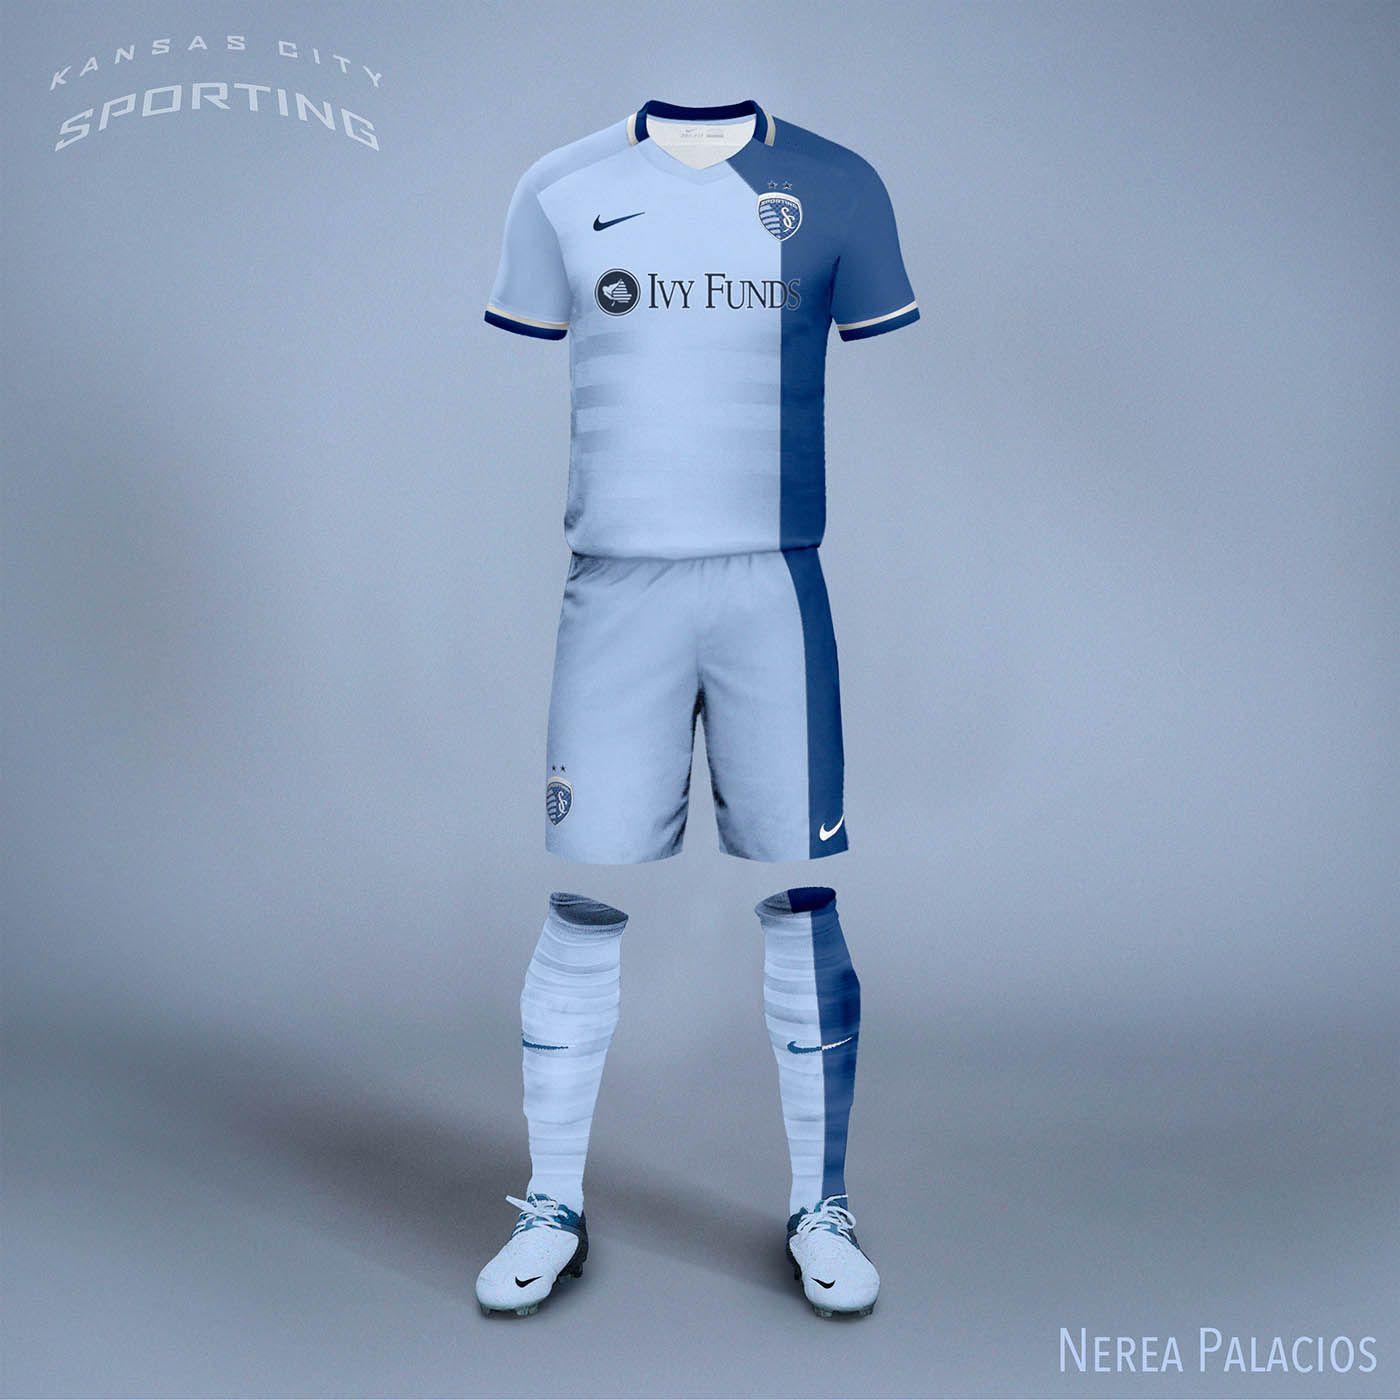 Nike MLS Concept Kits By Nerea Palacios